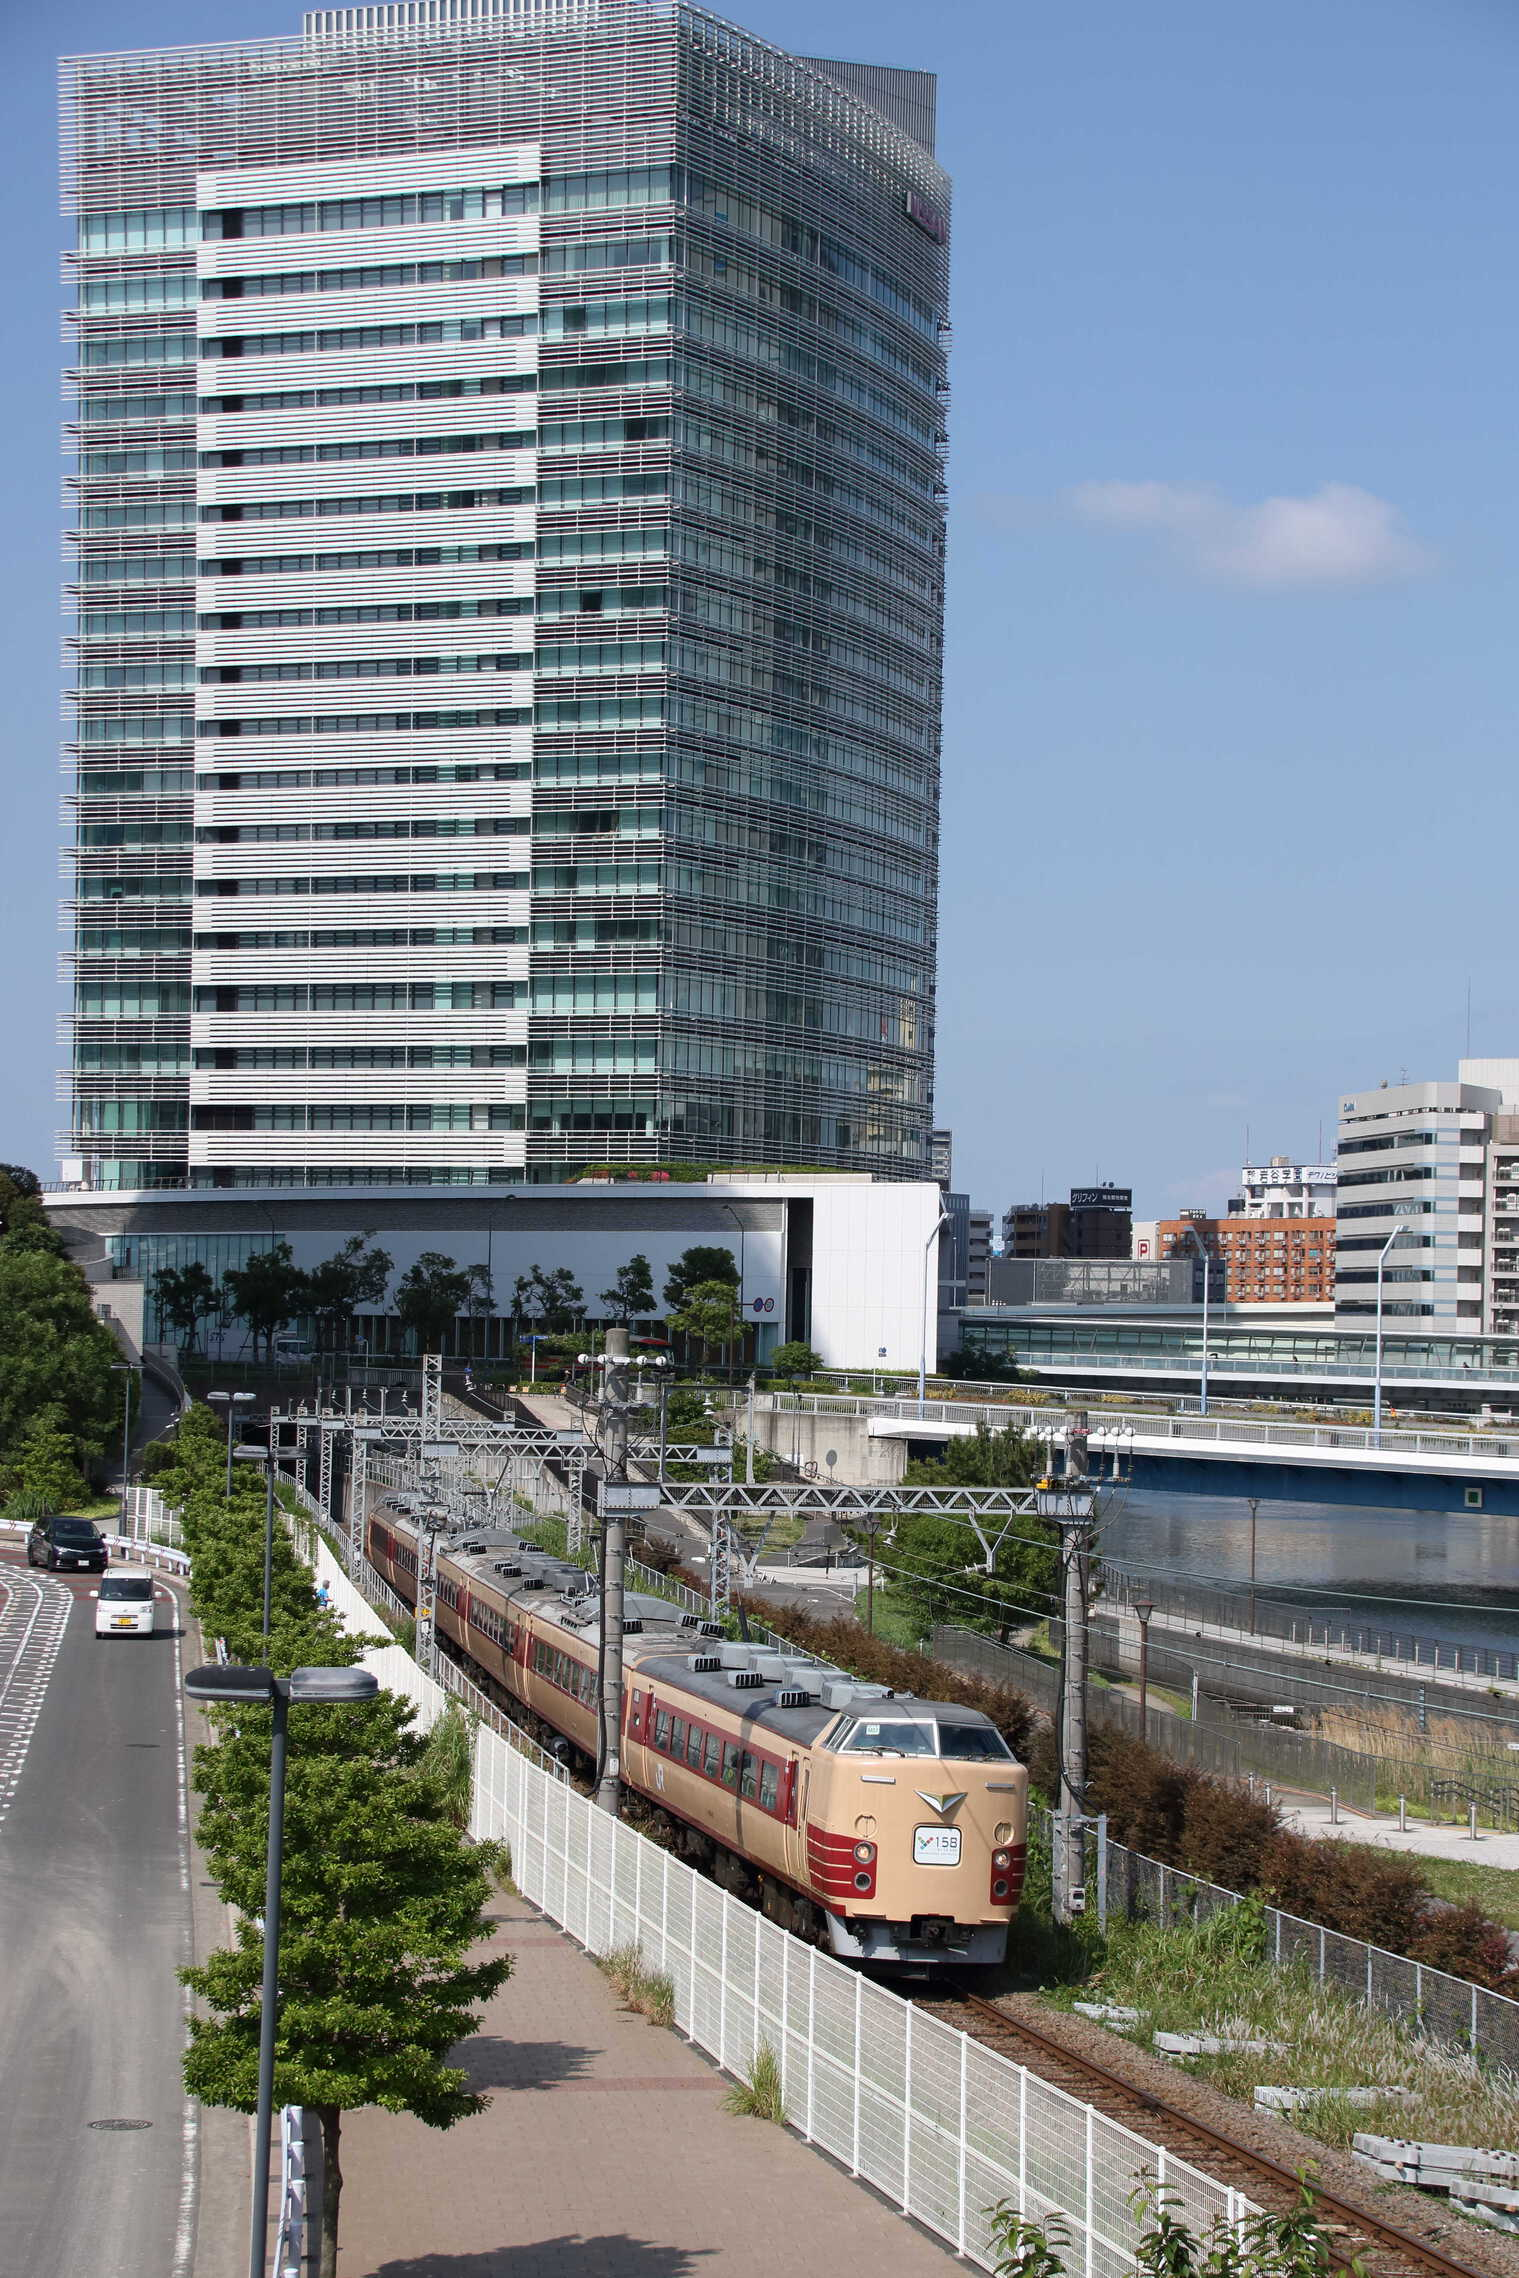 9822M 団臨(浜504) 横浜セントラルタウンフェスティバルY158記念列車の旅 189系 八トタM51編成